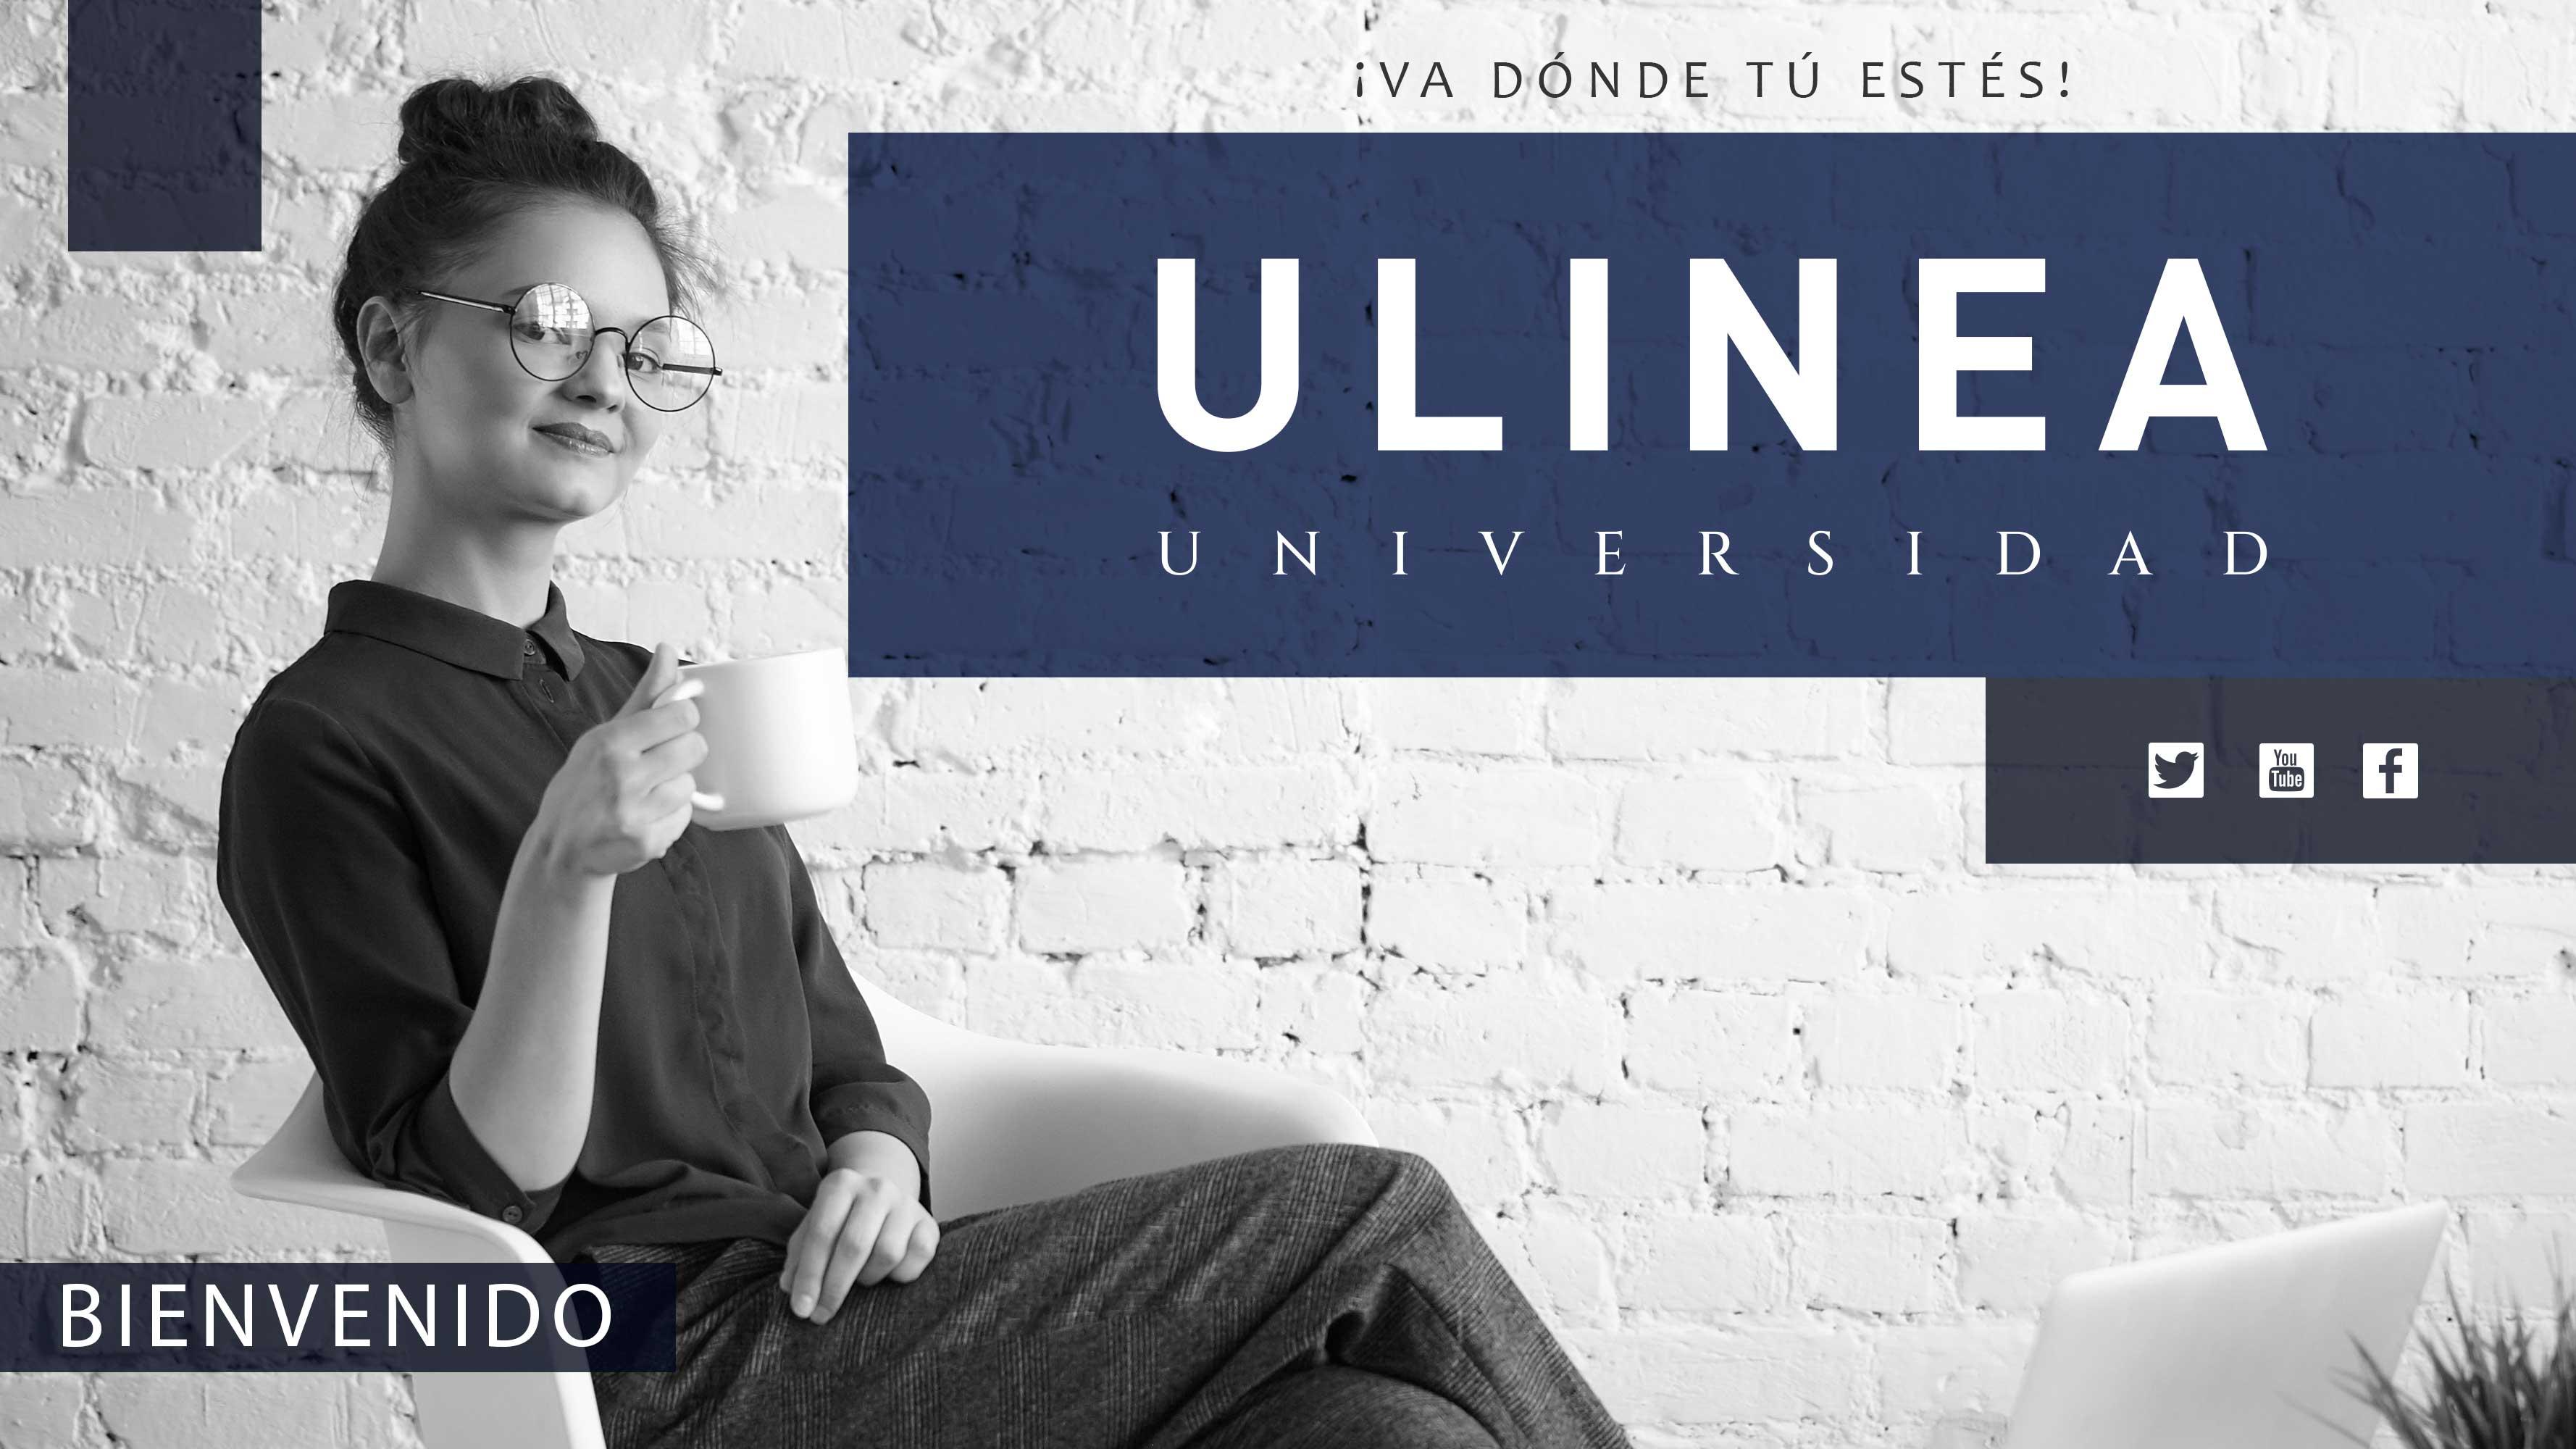 ULINEA